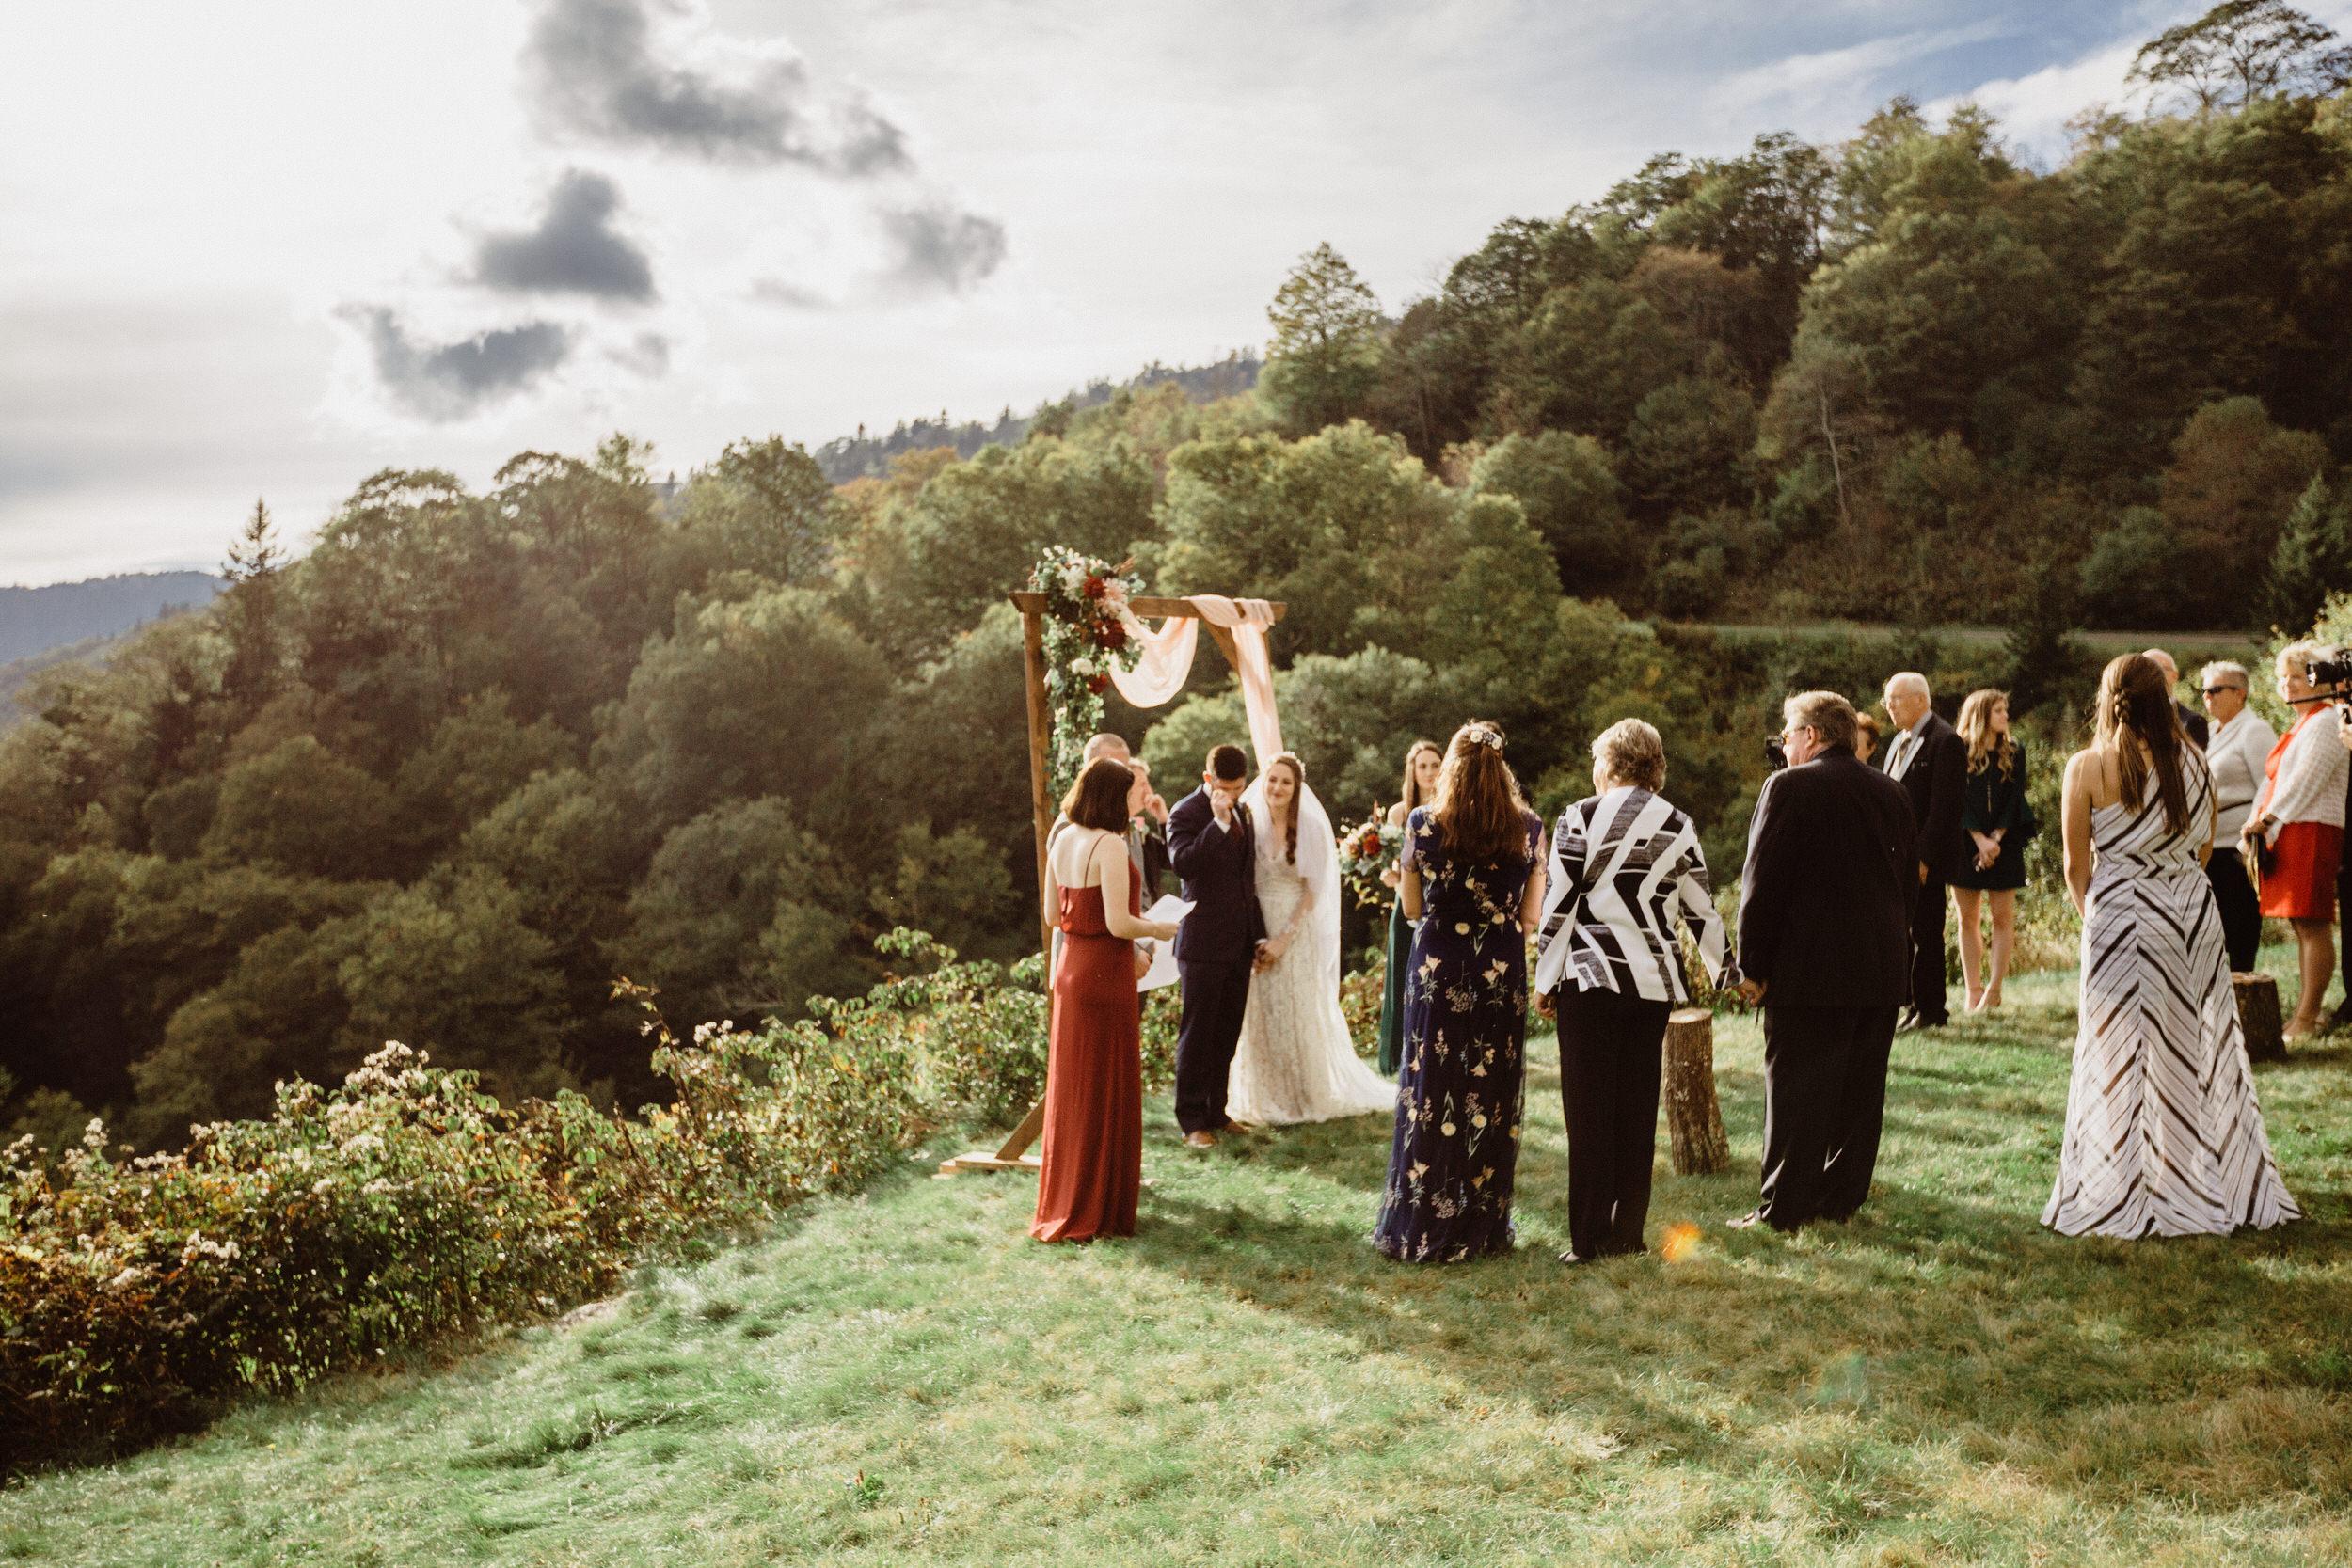 3. Elopement Ceremony- Cole + Rachel's Great Smoky Mountain National Park Elopement-110.jpg